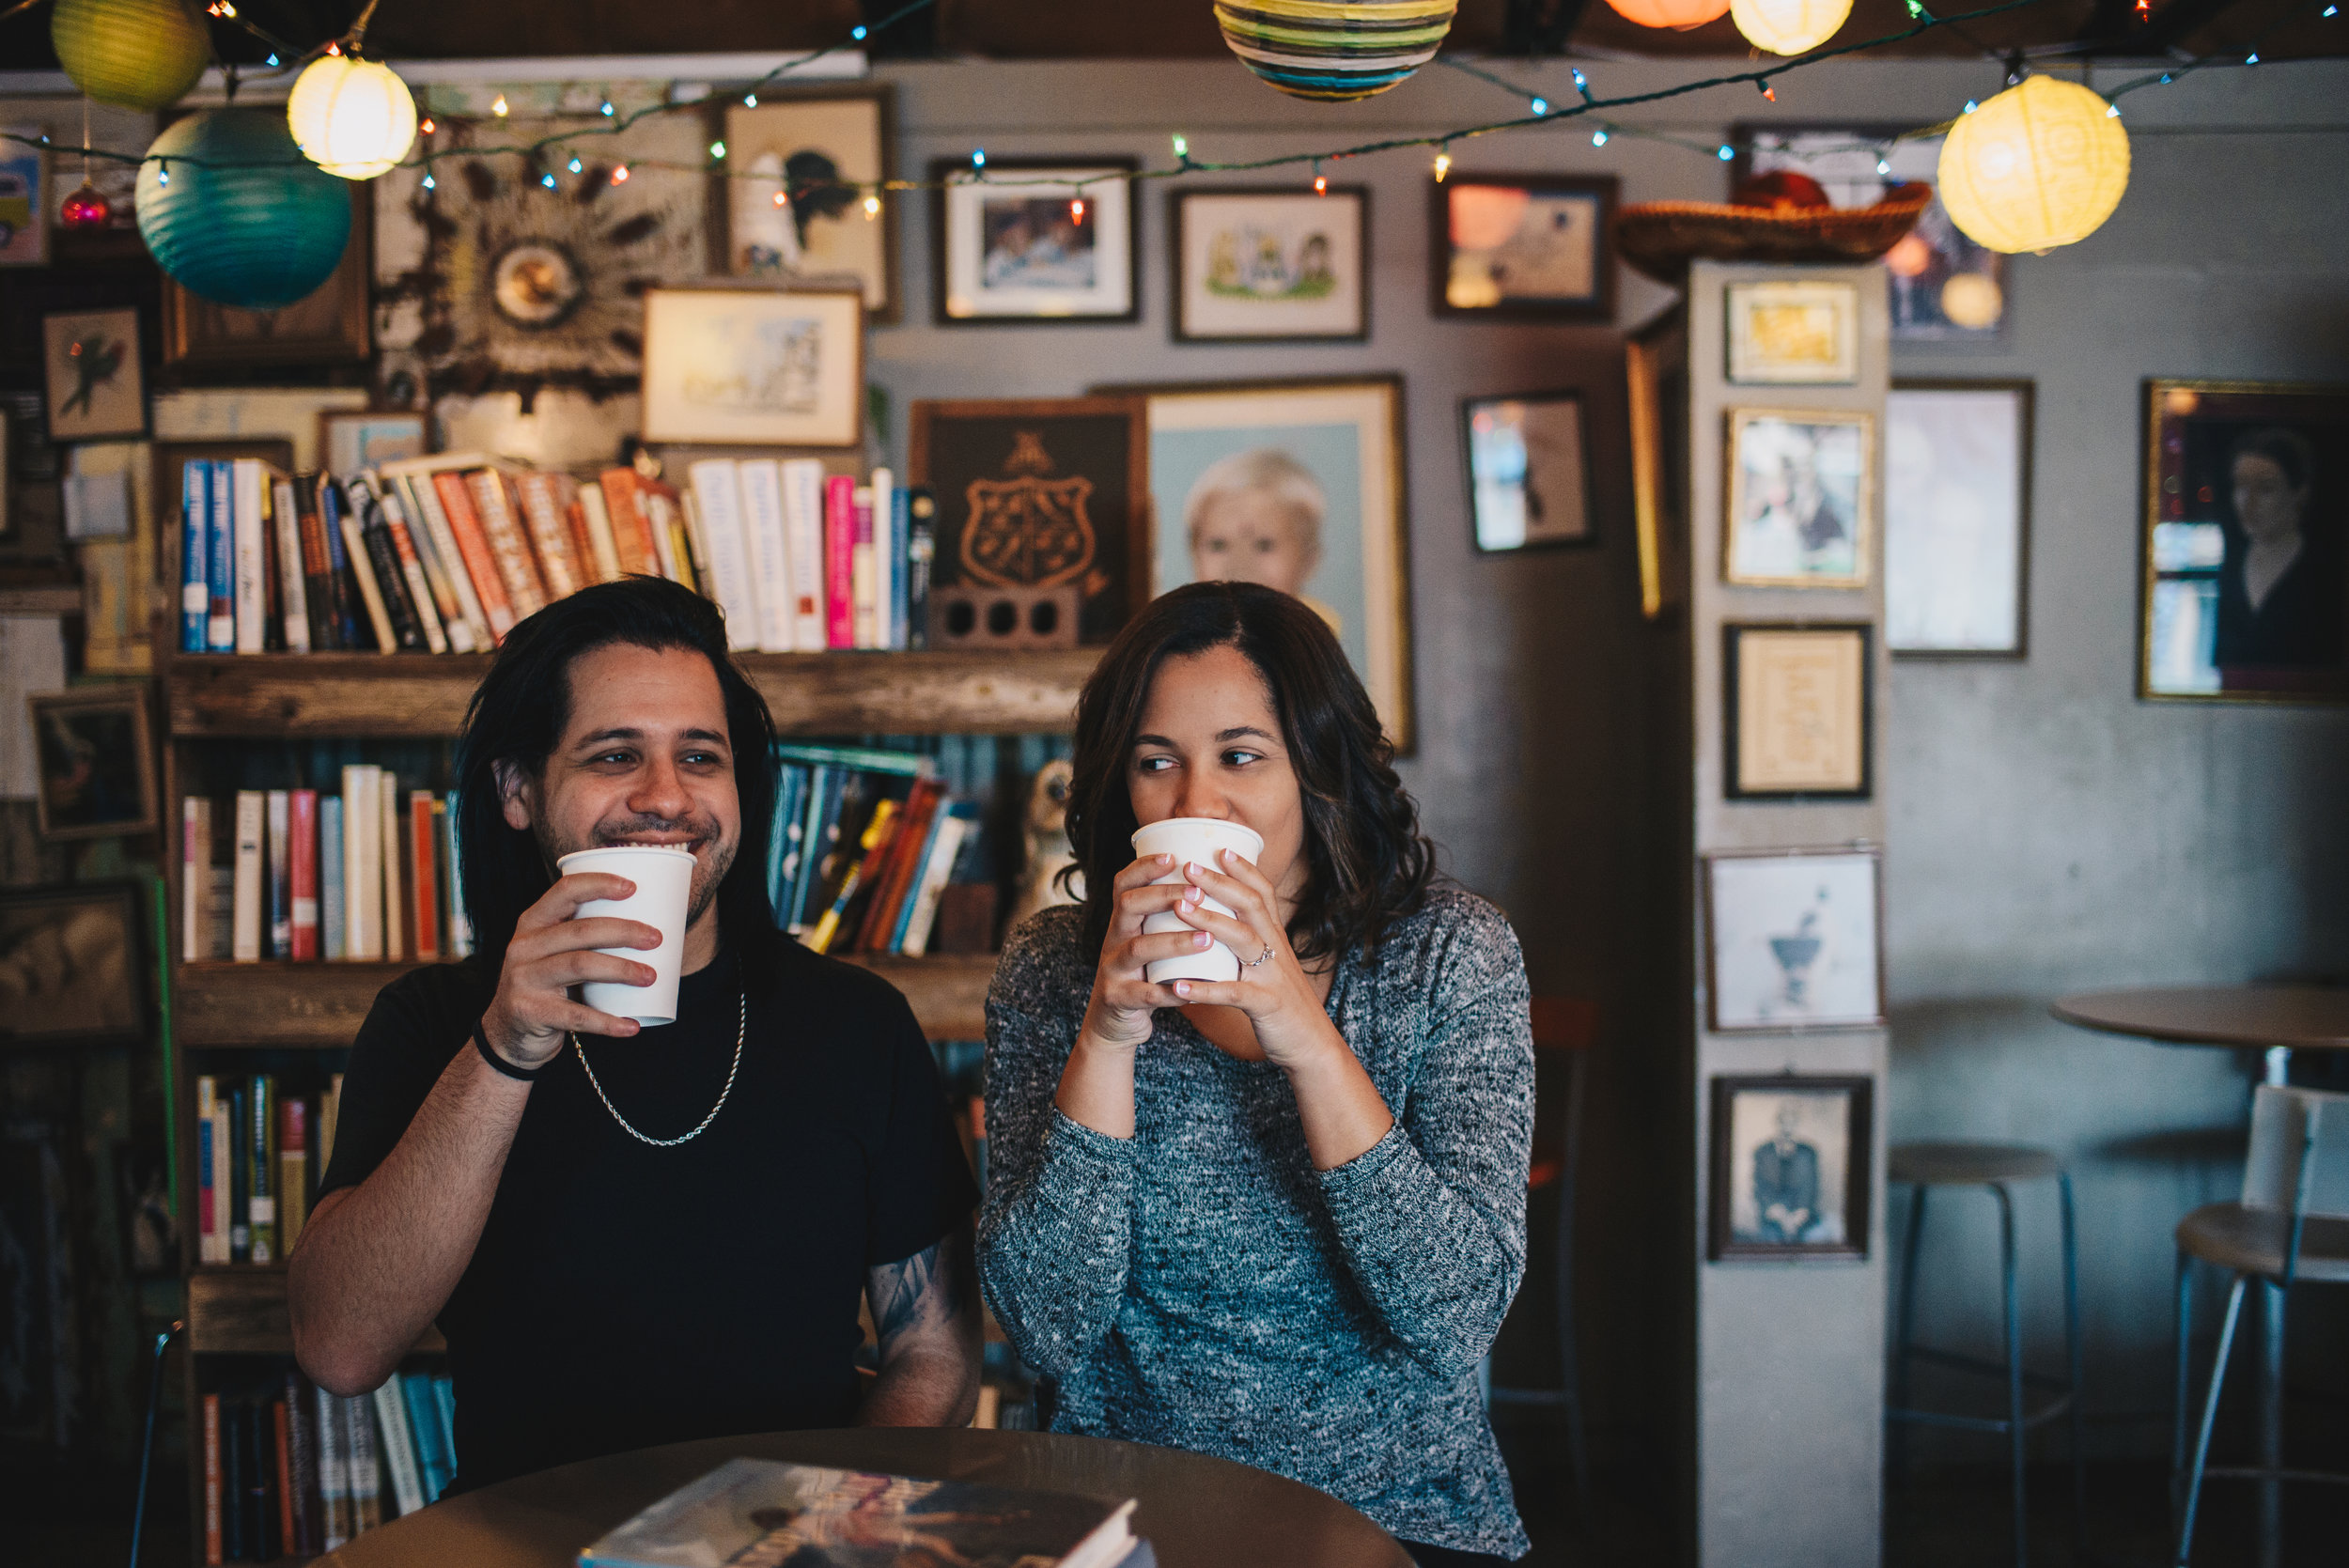 Los-Vargas-Photo-Central-Florida-Engagement-Coffee-Shop-Session-15.jpg